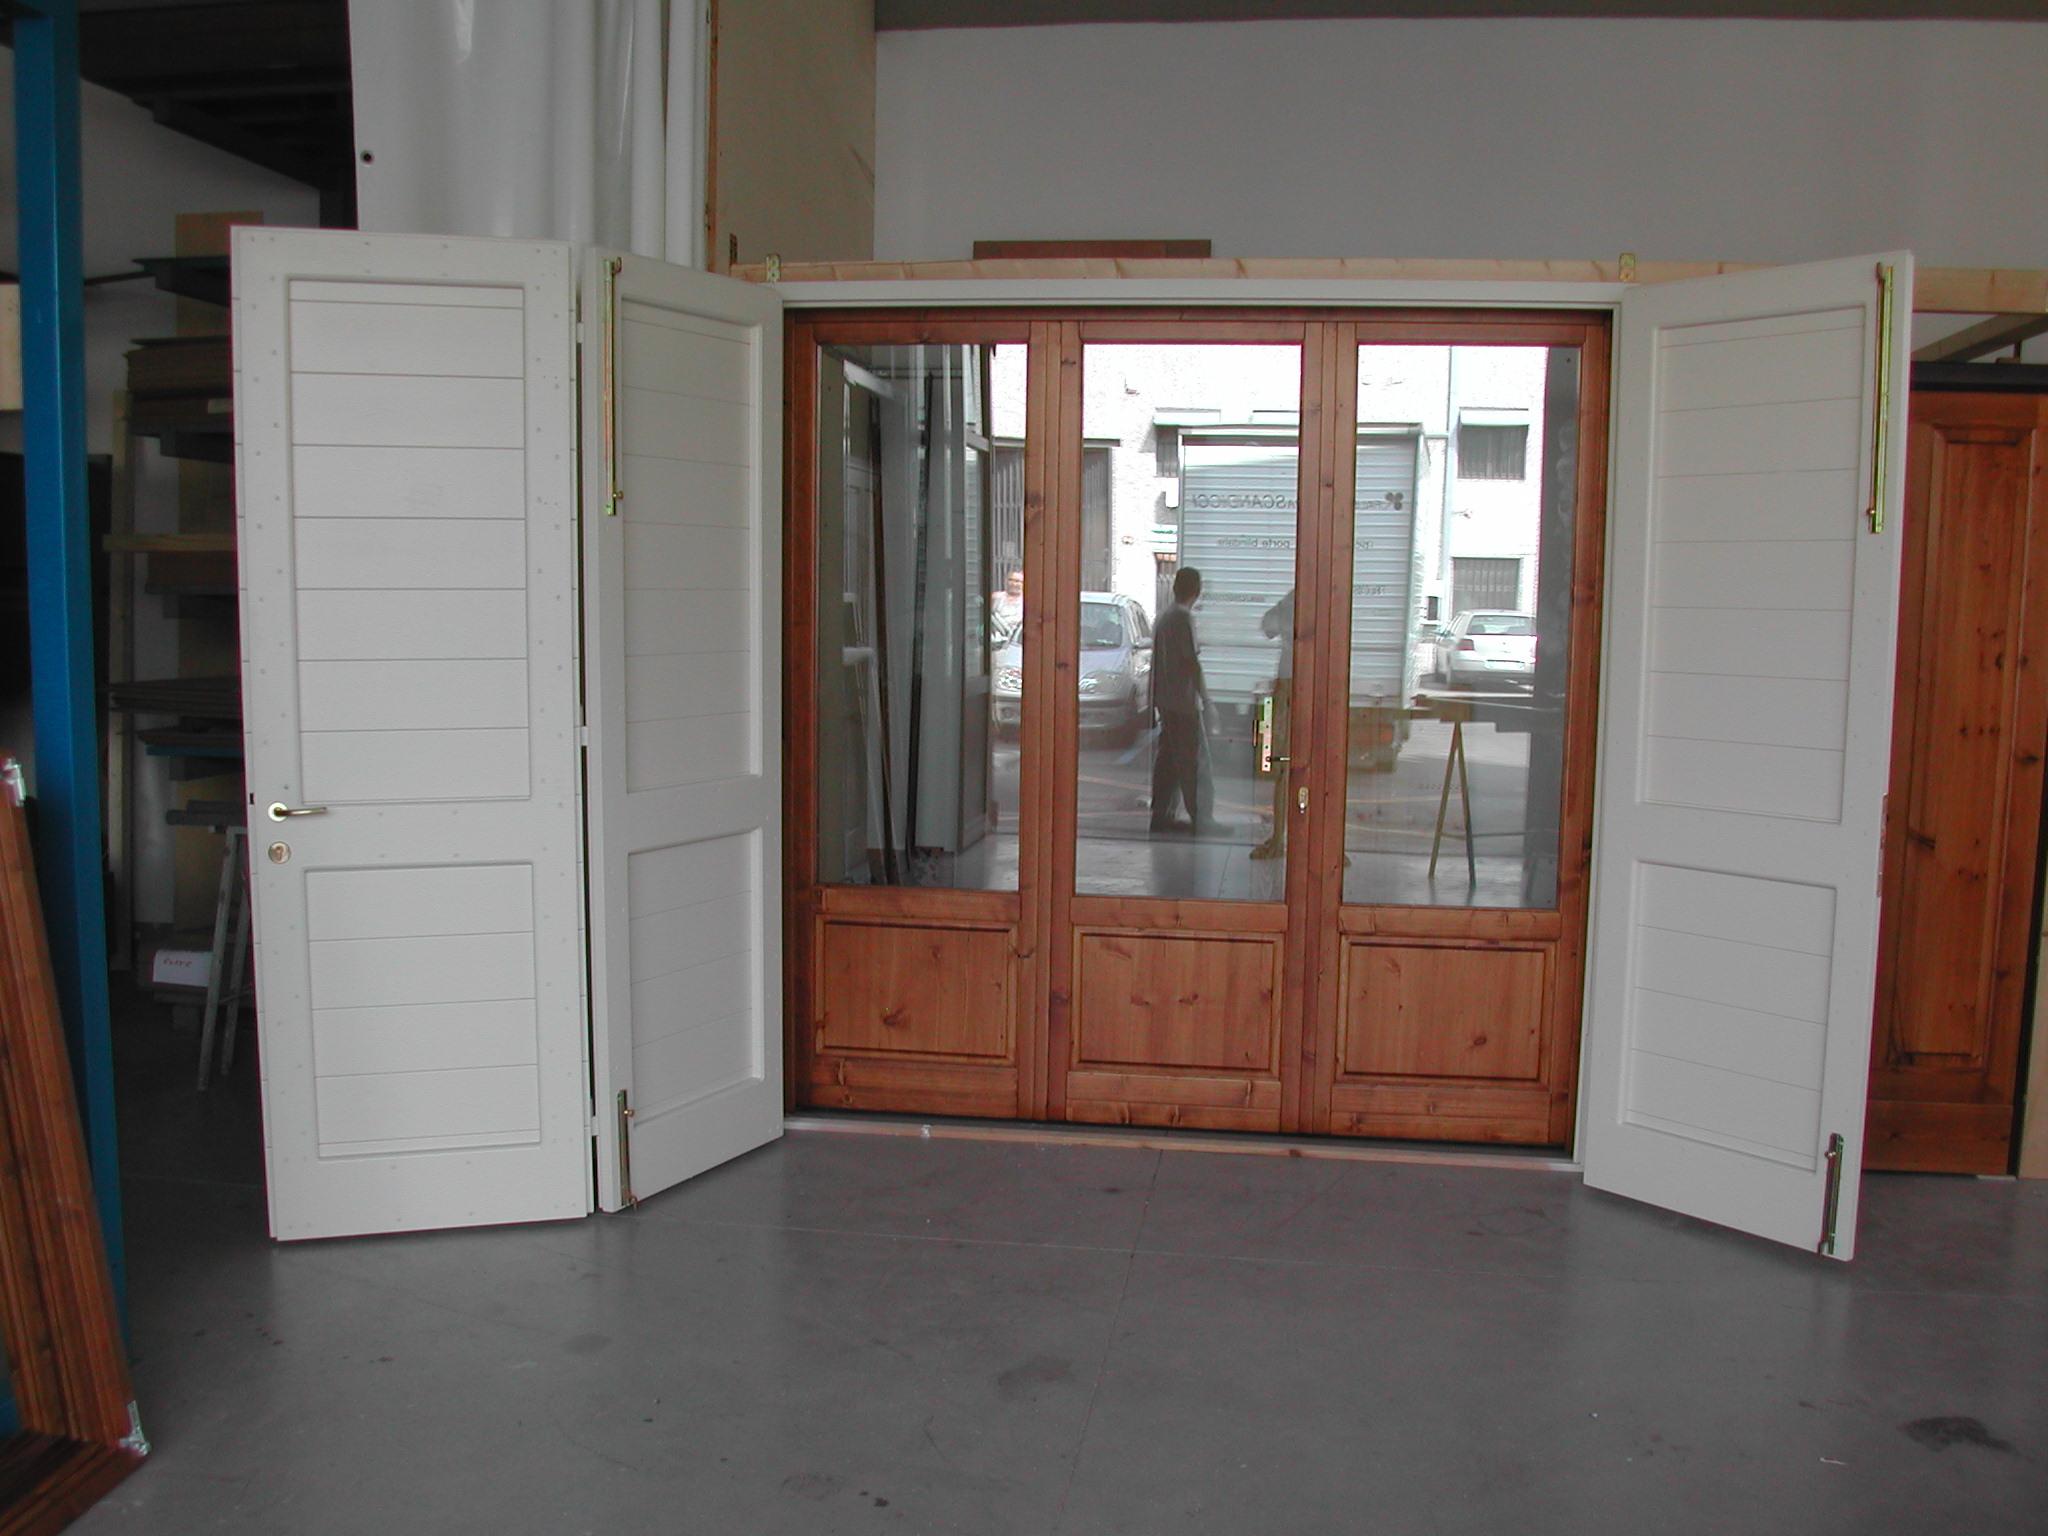 Finestre portfolios falegnameria dal 1972 falegnameria - Finestra a 2 ante ...